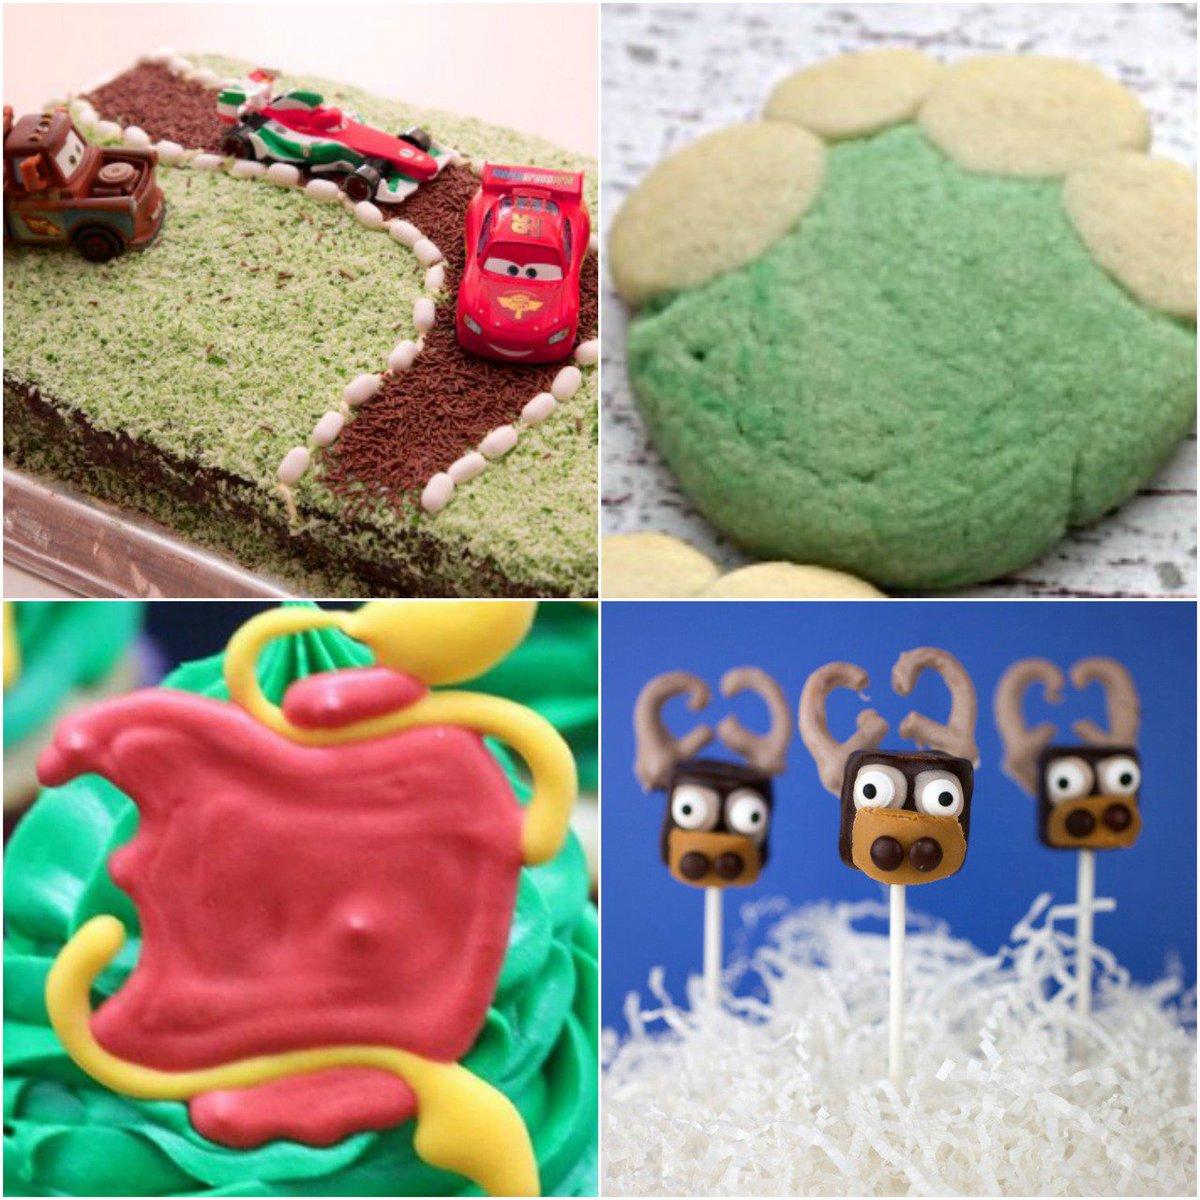 19 Fun Disney Themed Recipe Creations  http:// bit.ly/2s1BvsP  &nbsp;   #Disney #Recipes #DisneySide <br>http://pic.twitter.com/2M1ah0a5Uu